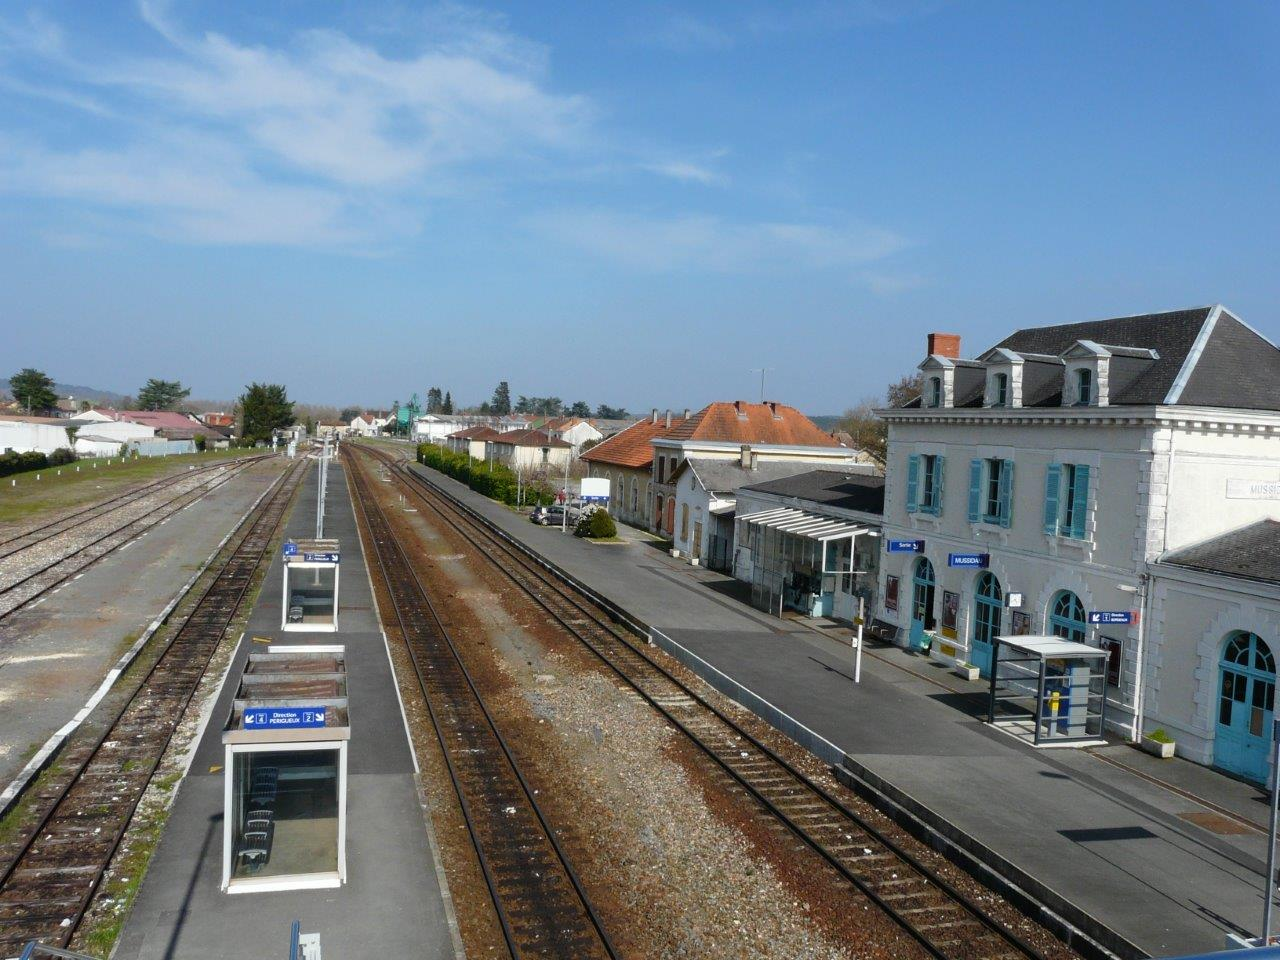 gare-de-mussidan-train-station